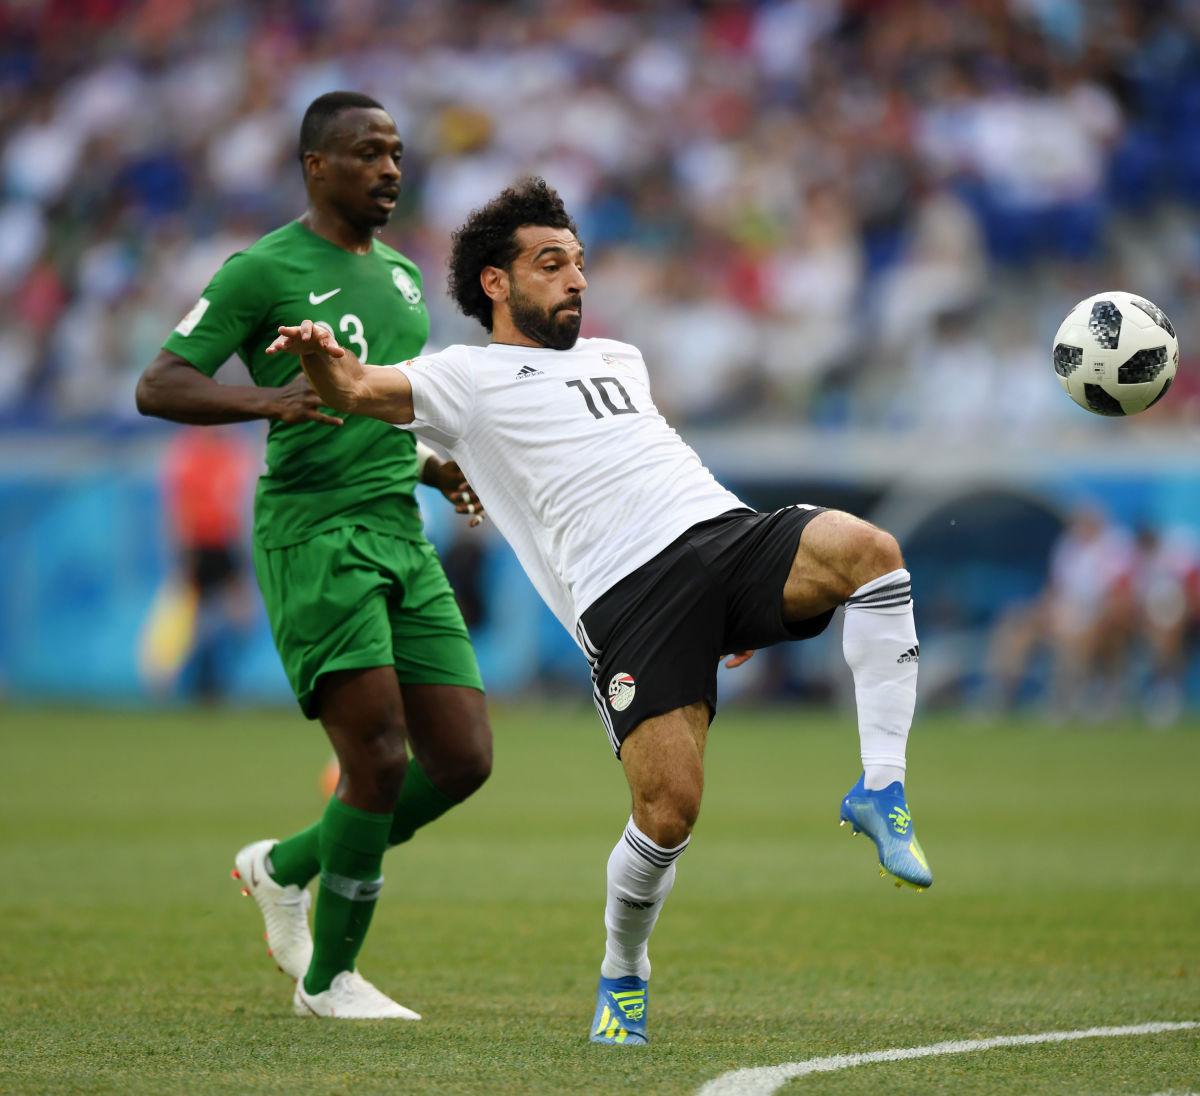 saudi-arabia-v-egypt-group-a-2018-fifa-world-cup-russia-5b3b818573f36c650700005a.jpg